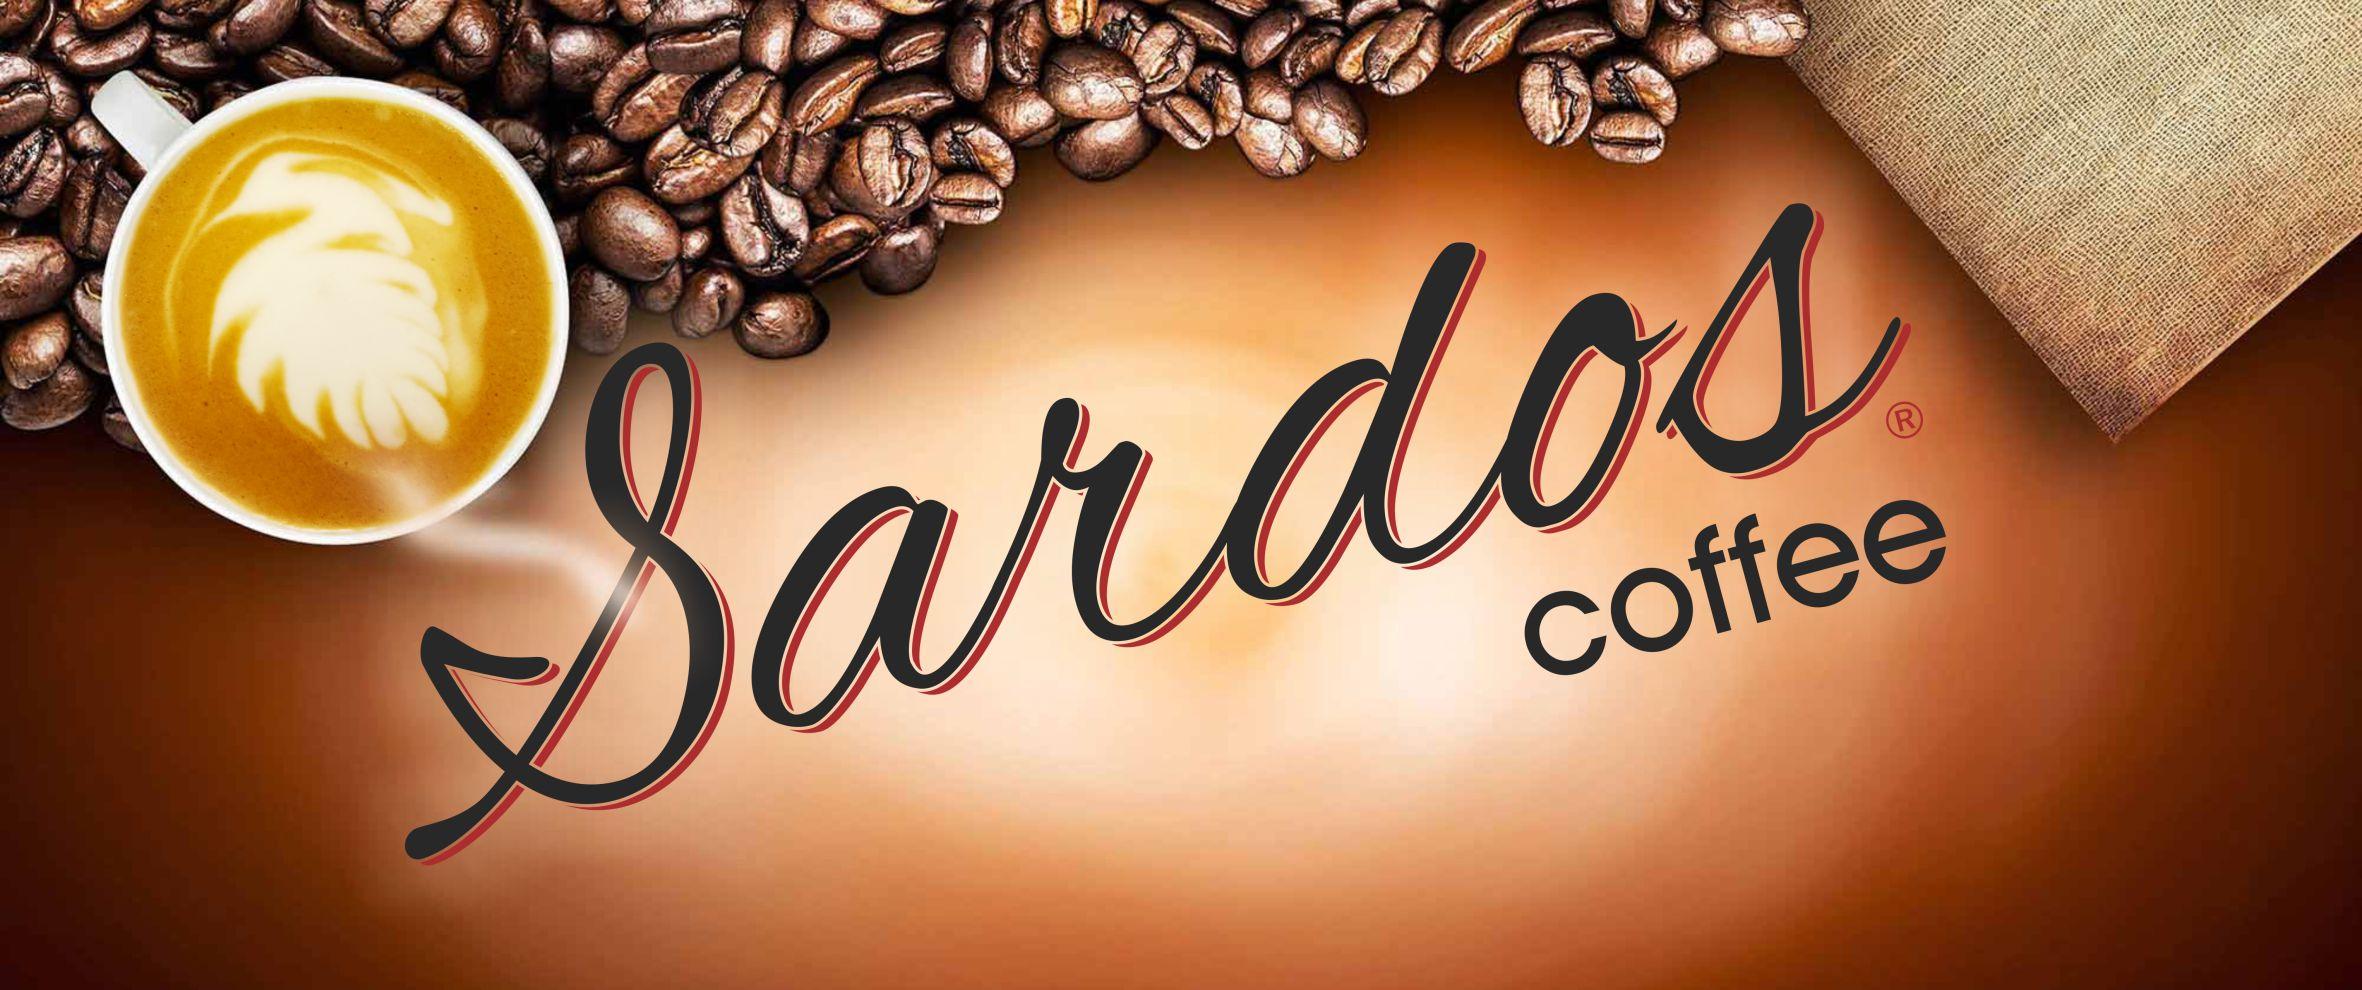 Sardos Coffee Banner